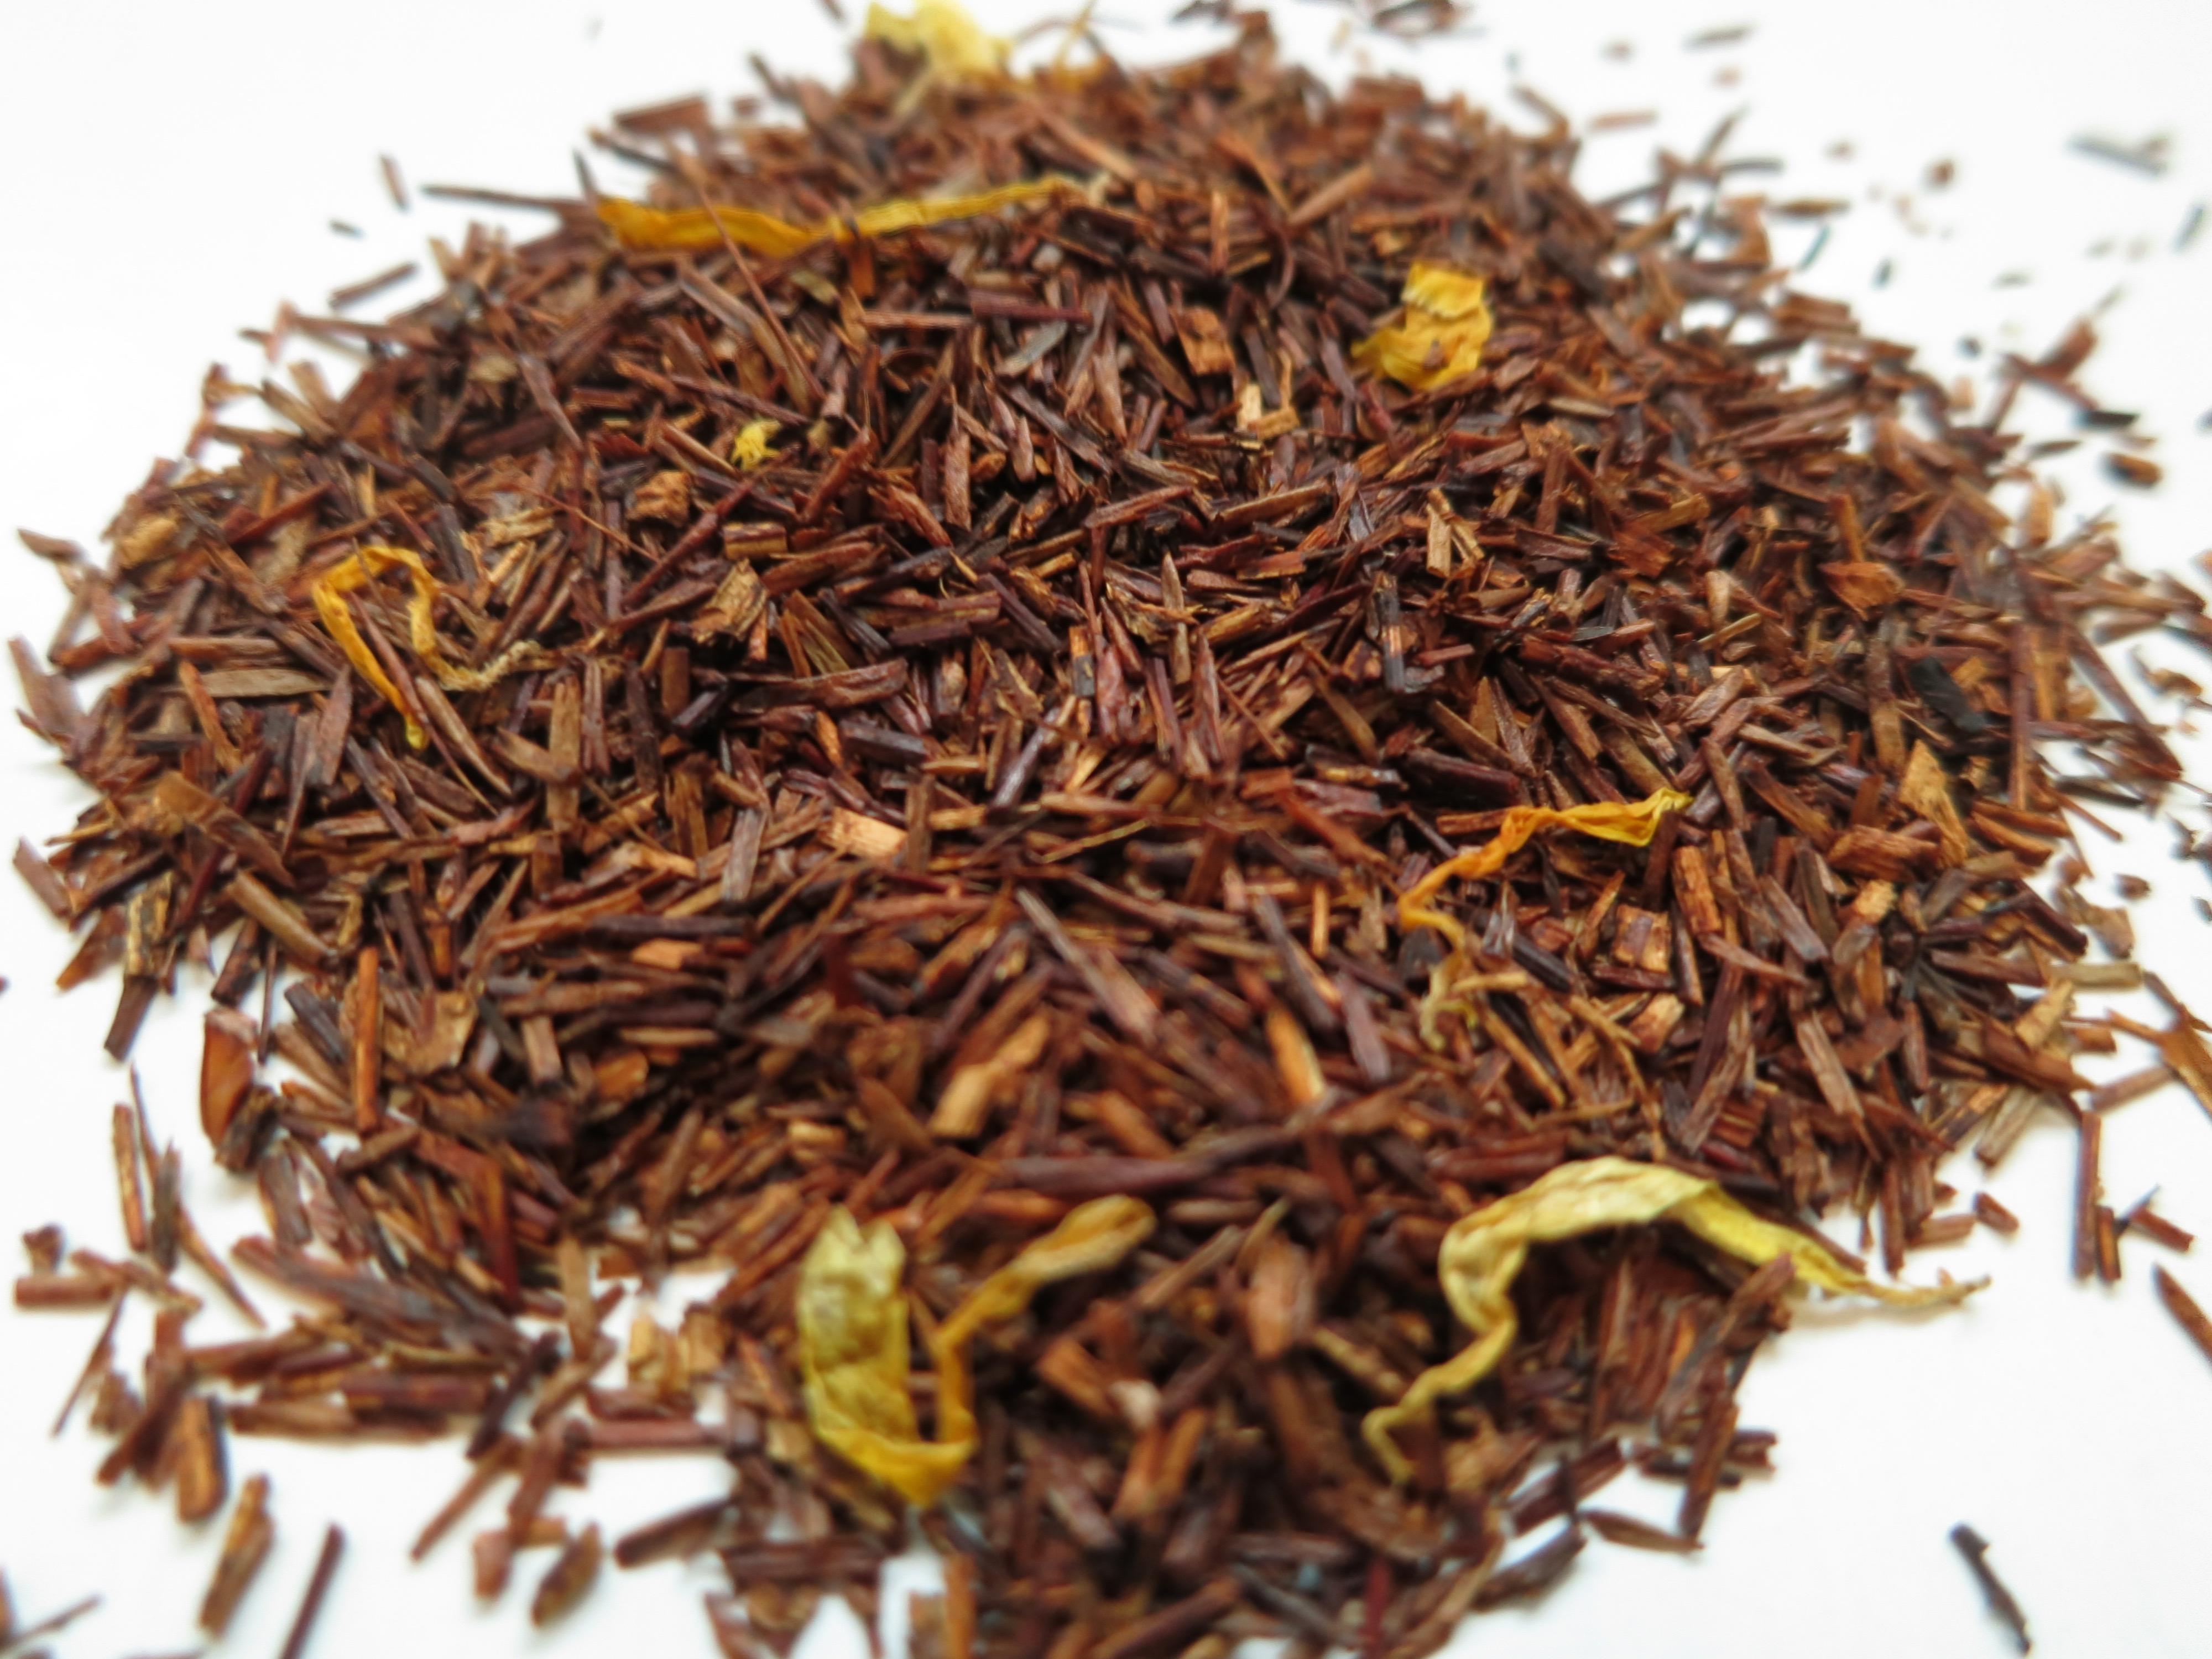 Image result for creme au caramel rooibos tea